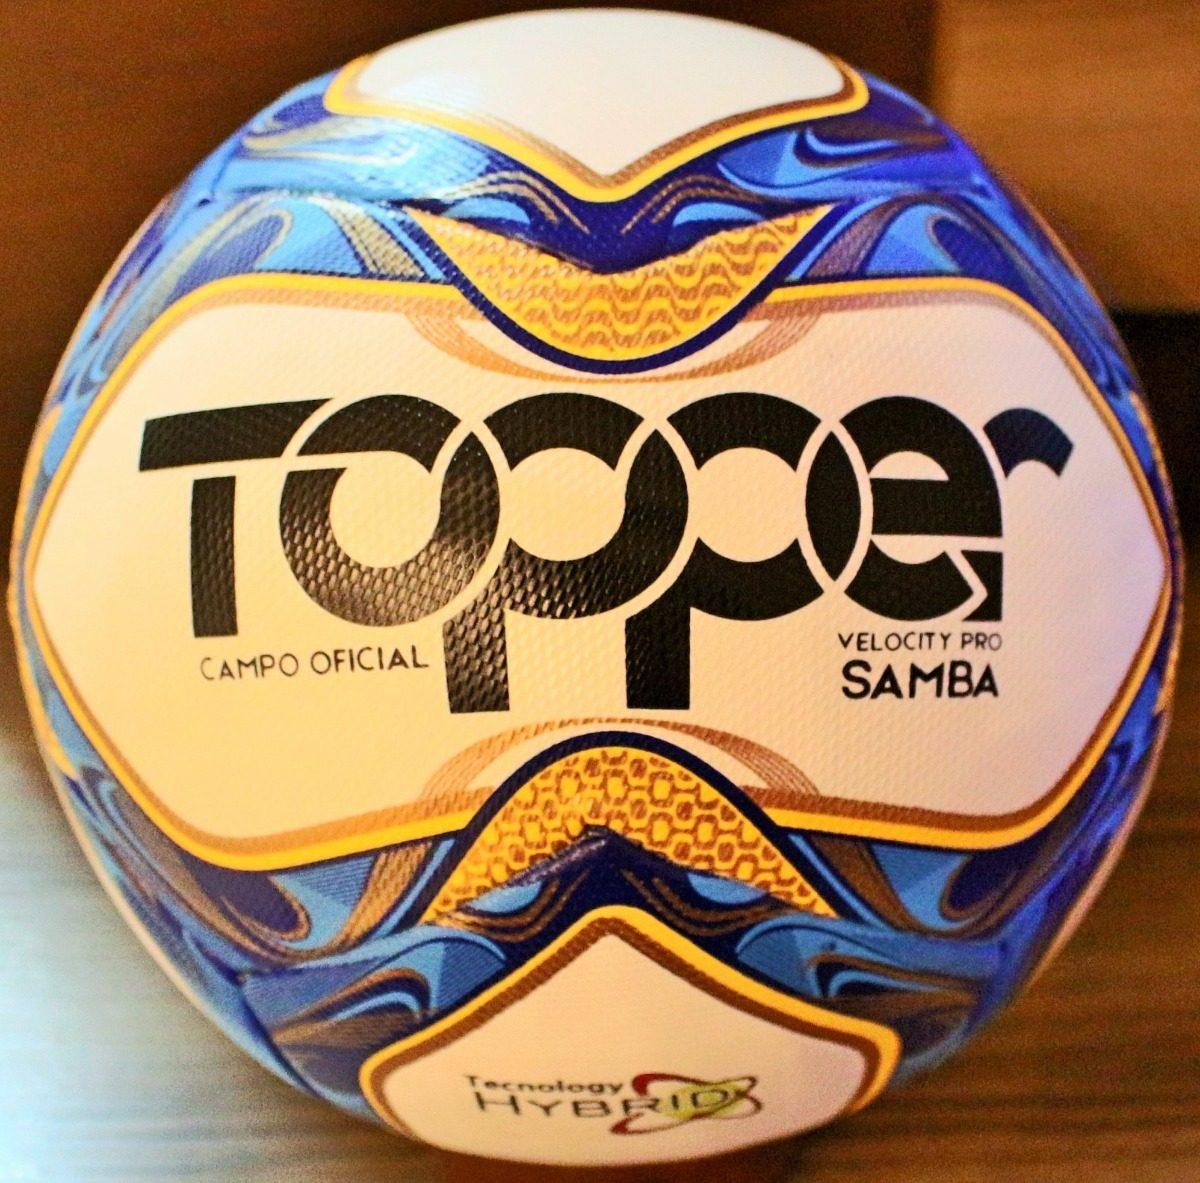 094aa217b76af nova bola topper samba velocity pro carioca 2019. Carregando zoom.